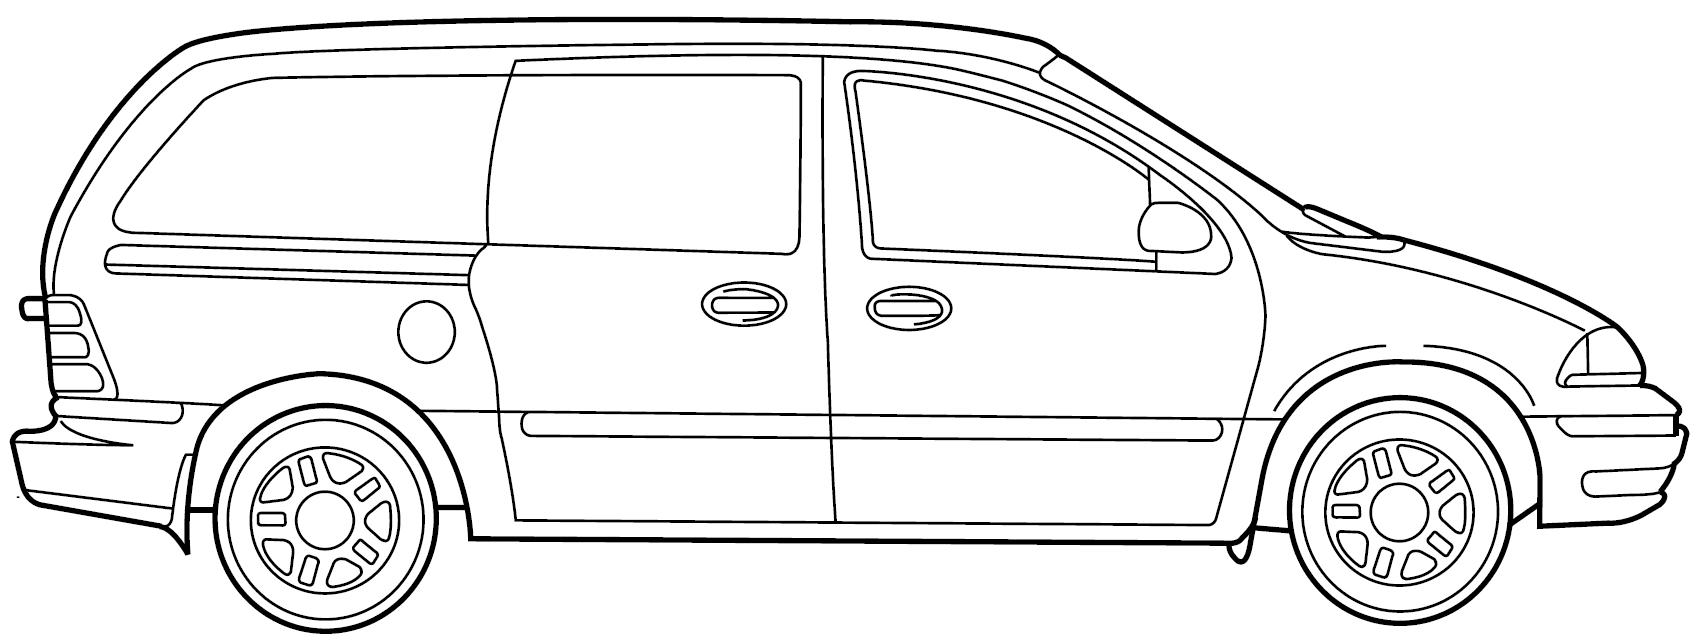 image stock At paintingvalley com explore. Minivan drawing